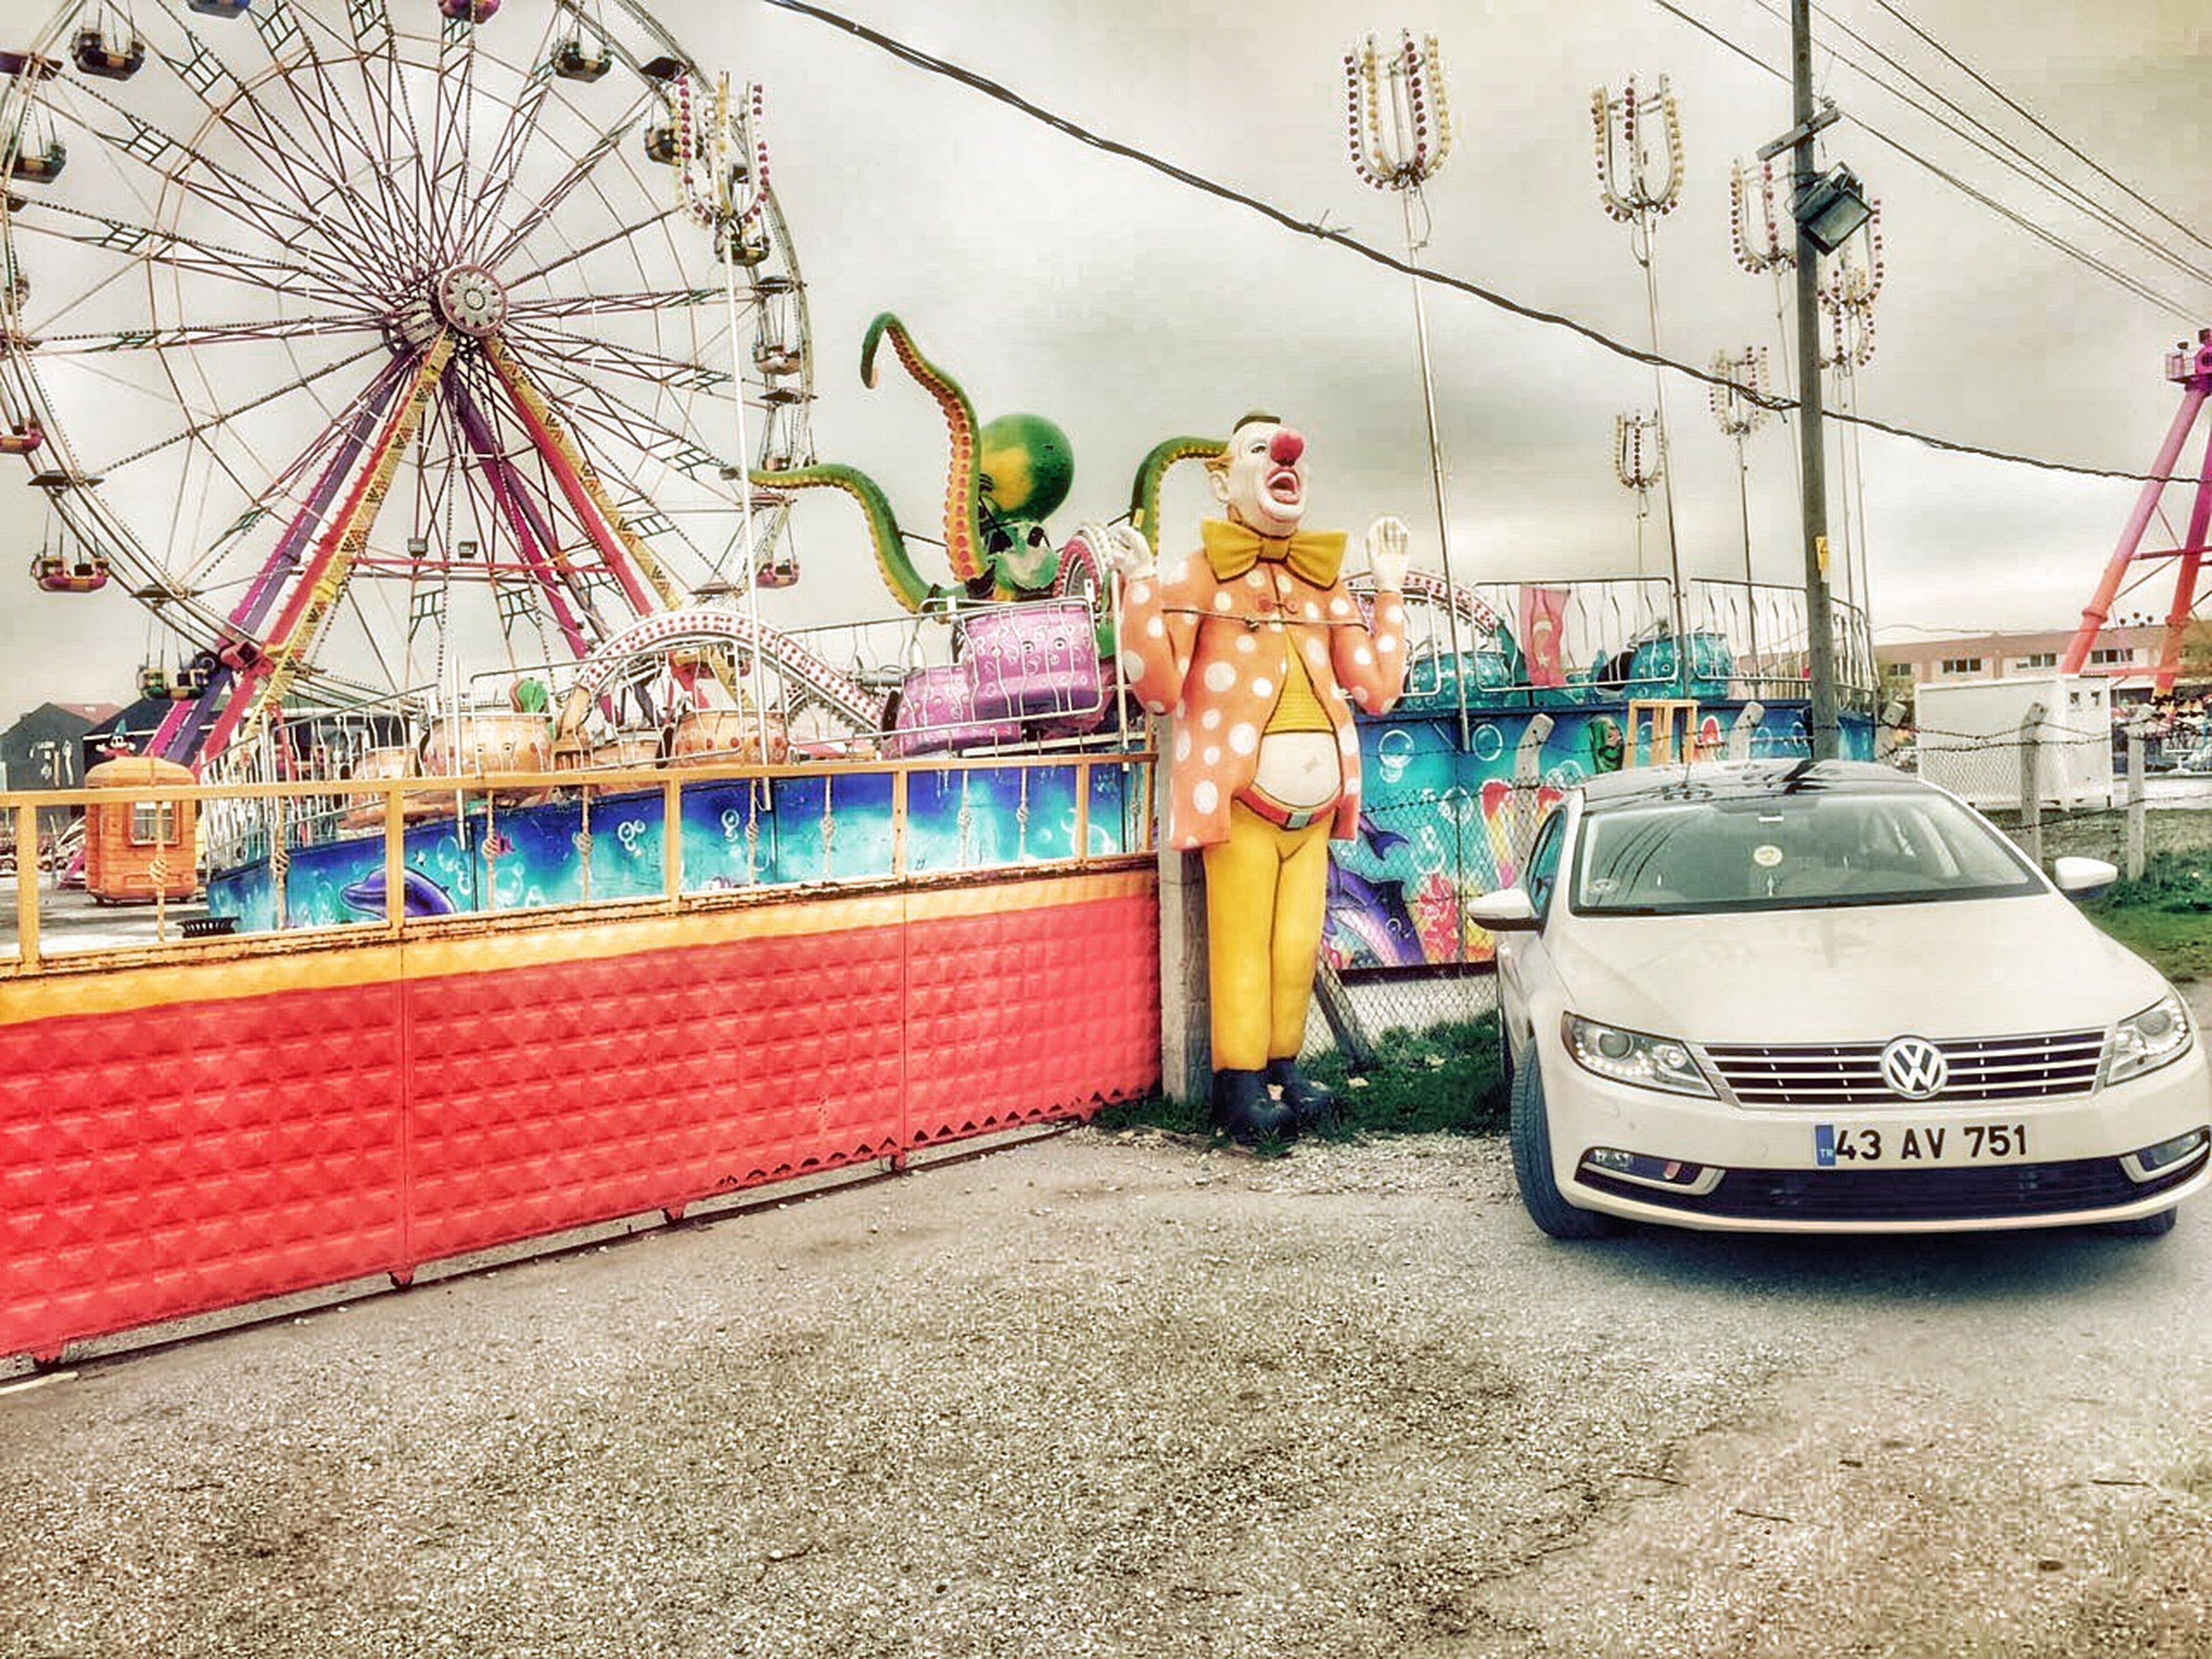 amusement park, amusement park ride, arts culture and entertainment, transportation, mode of transport, sky, architecture, built structure, art and craft, ferris wheel, art, land vehicle, incidental people, creativity, carousel, travel, building exterior, sculpture, animal representation, street